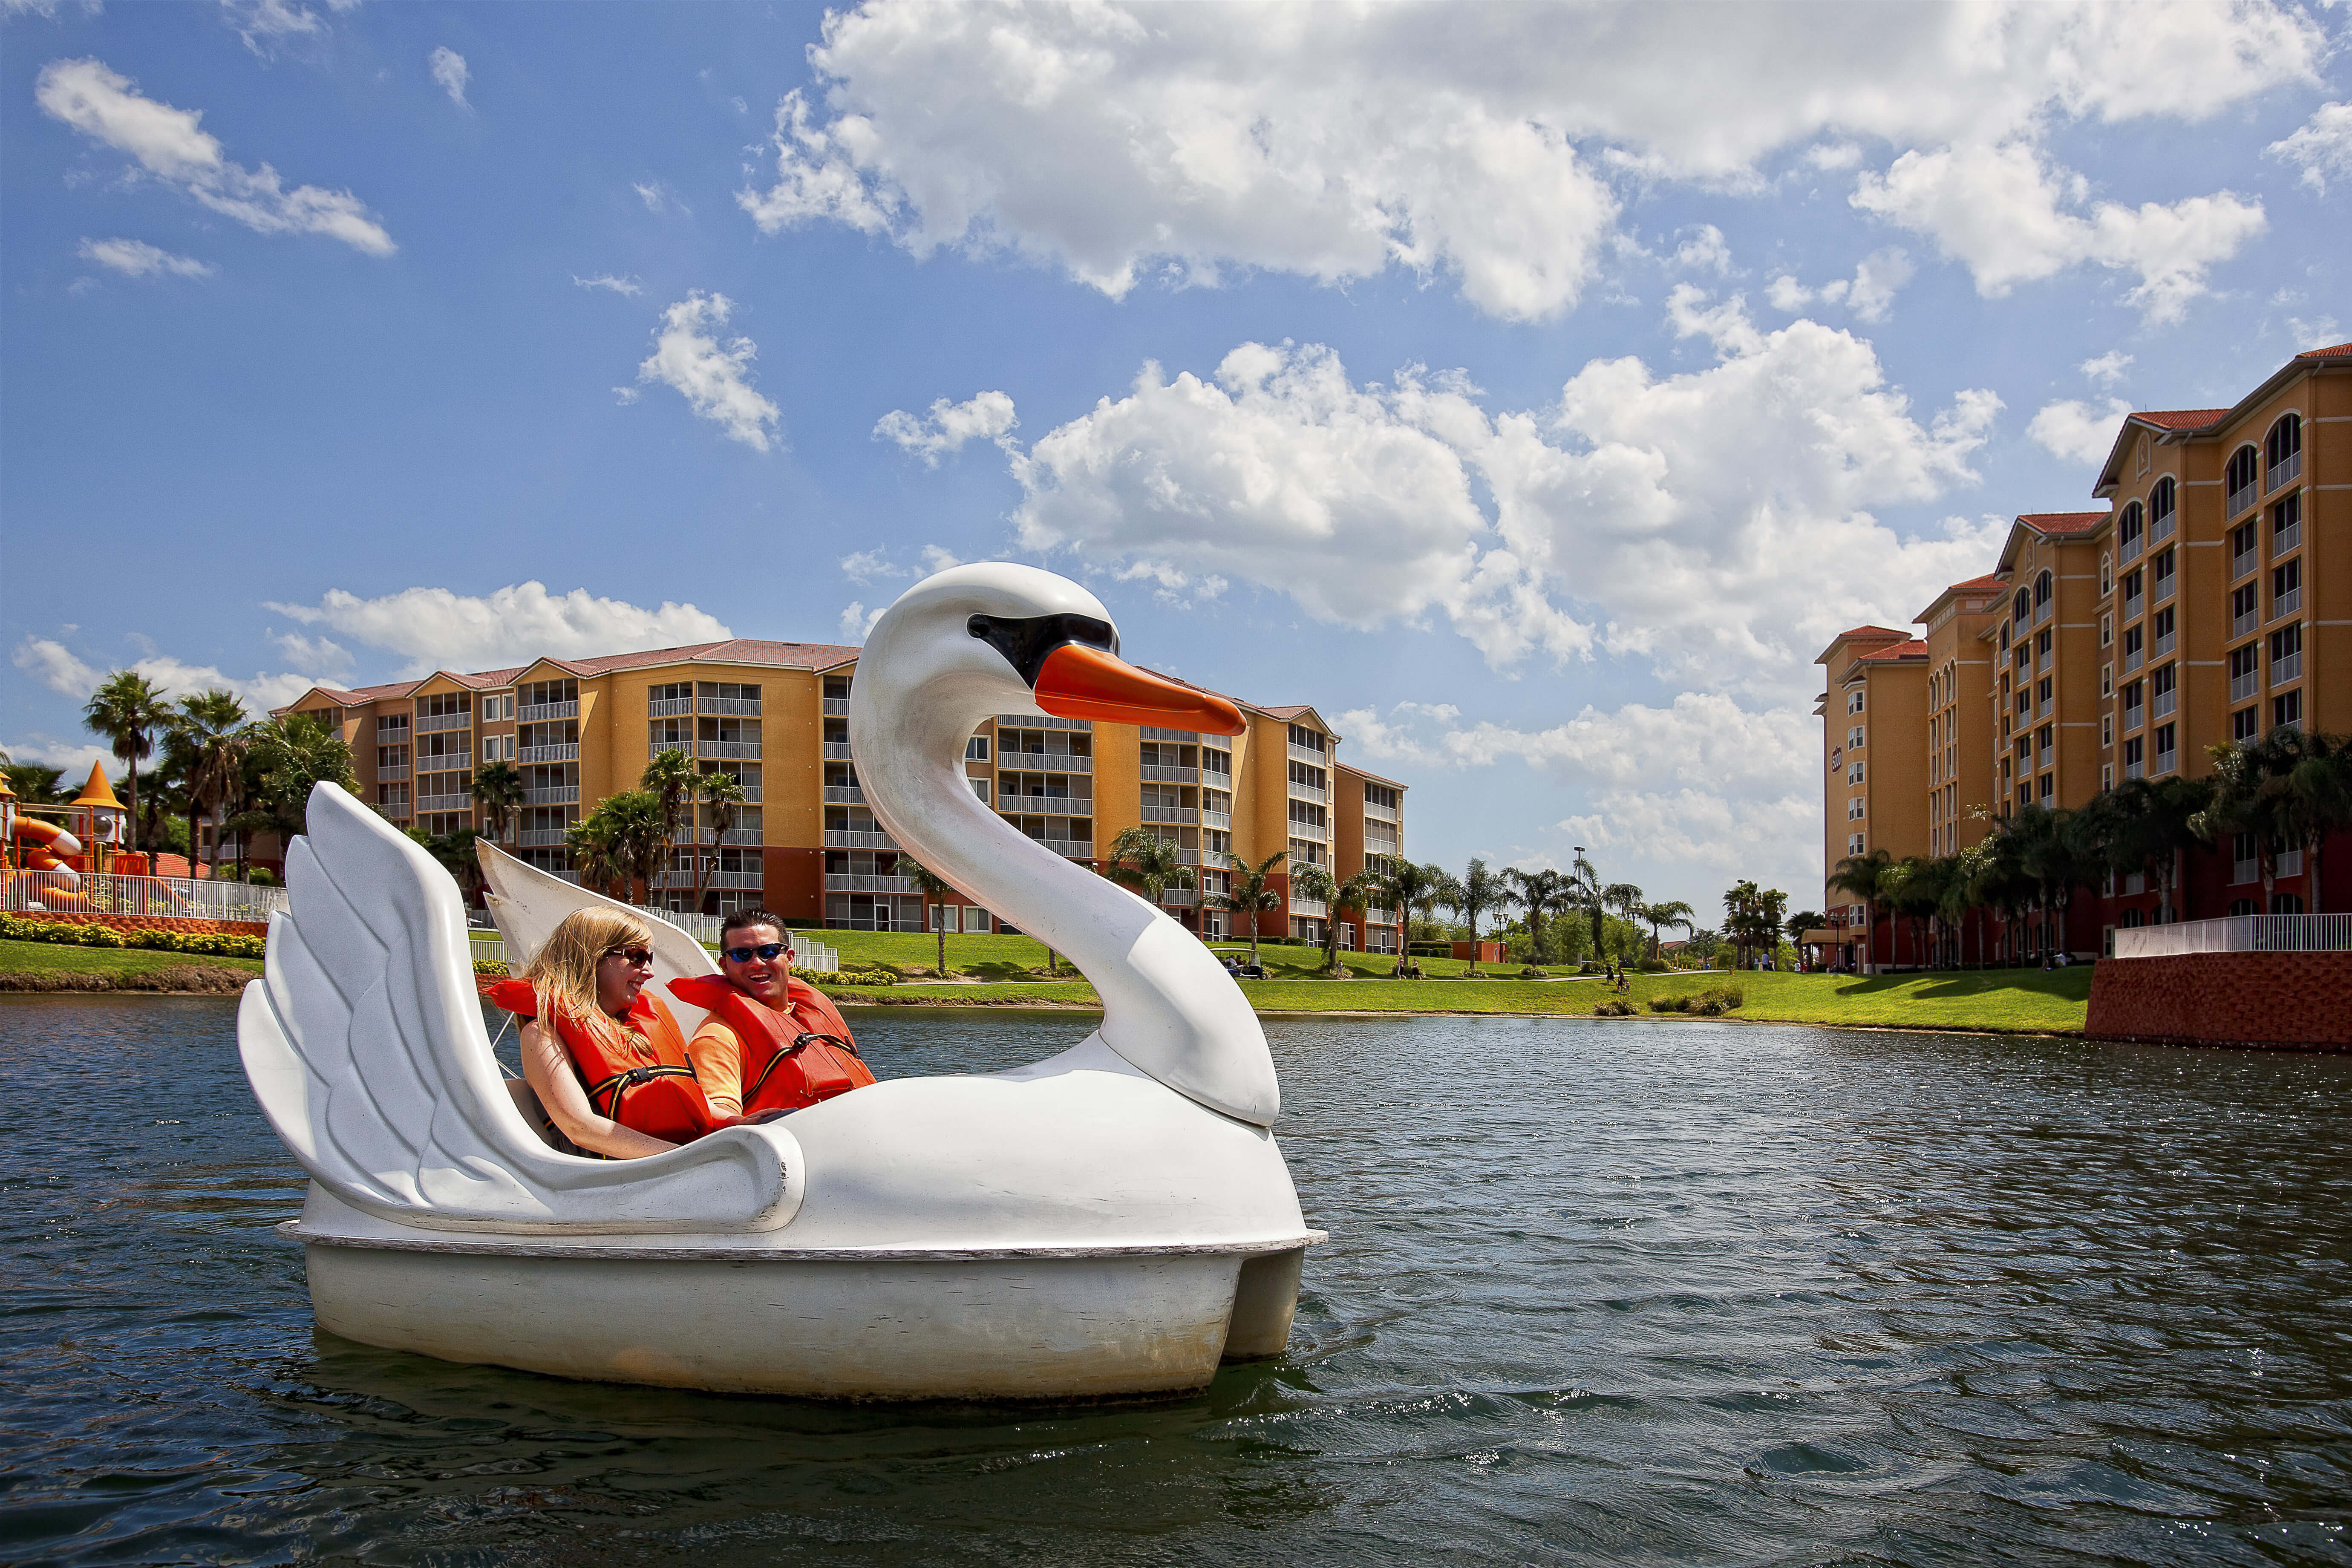 Discount Hotel Room Rates at an Orlando FL Resort Hotel | Westgate Vacation Villas Resort